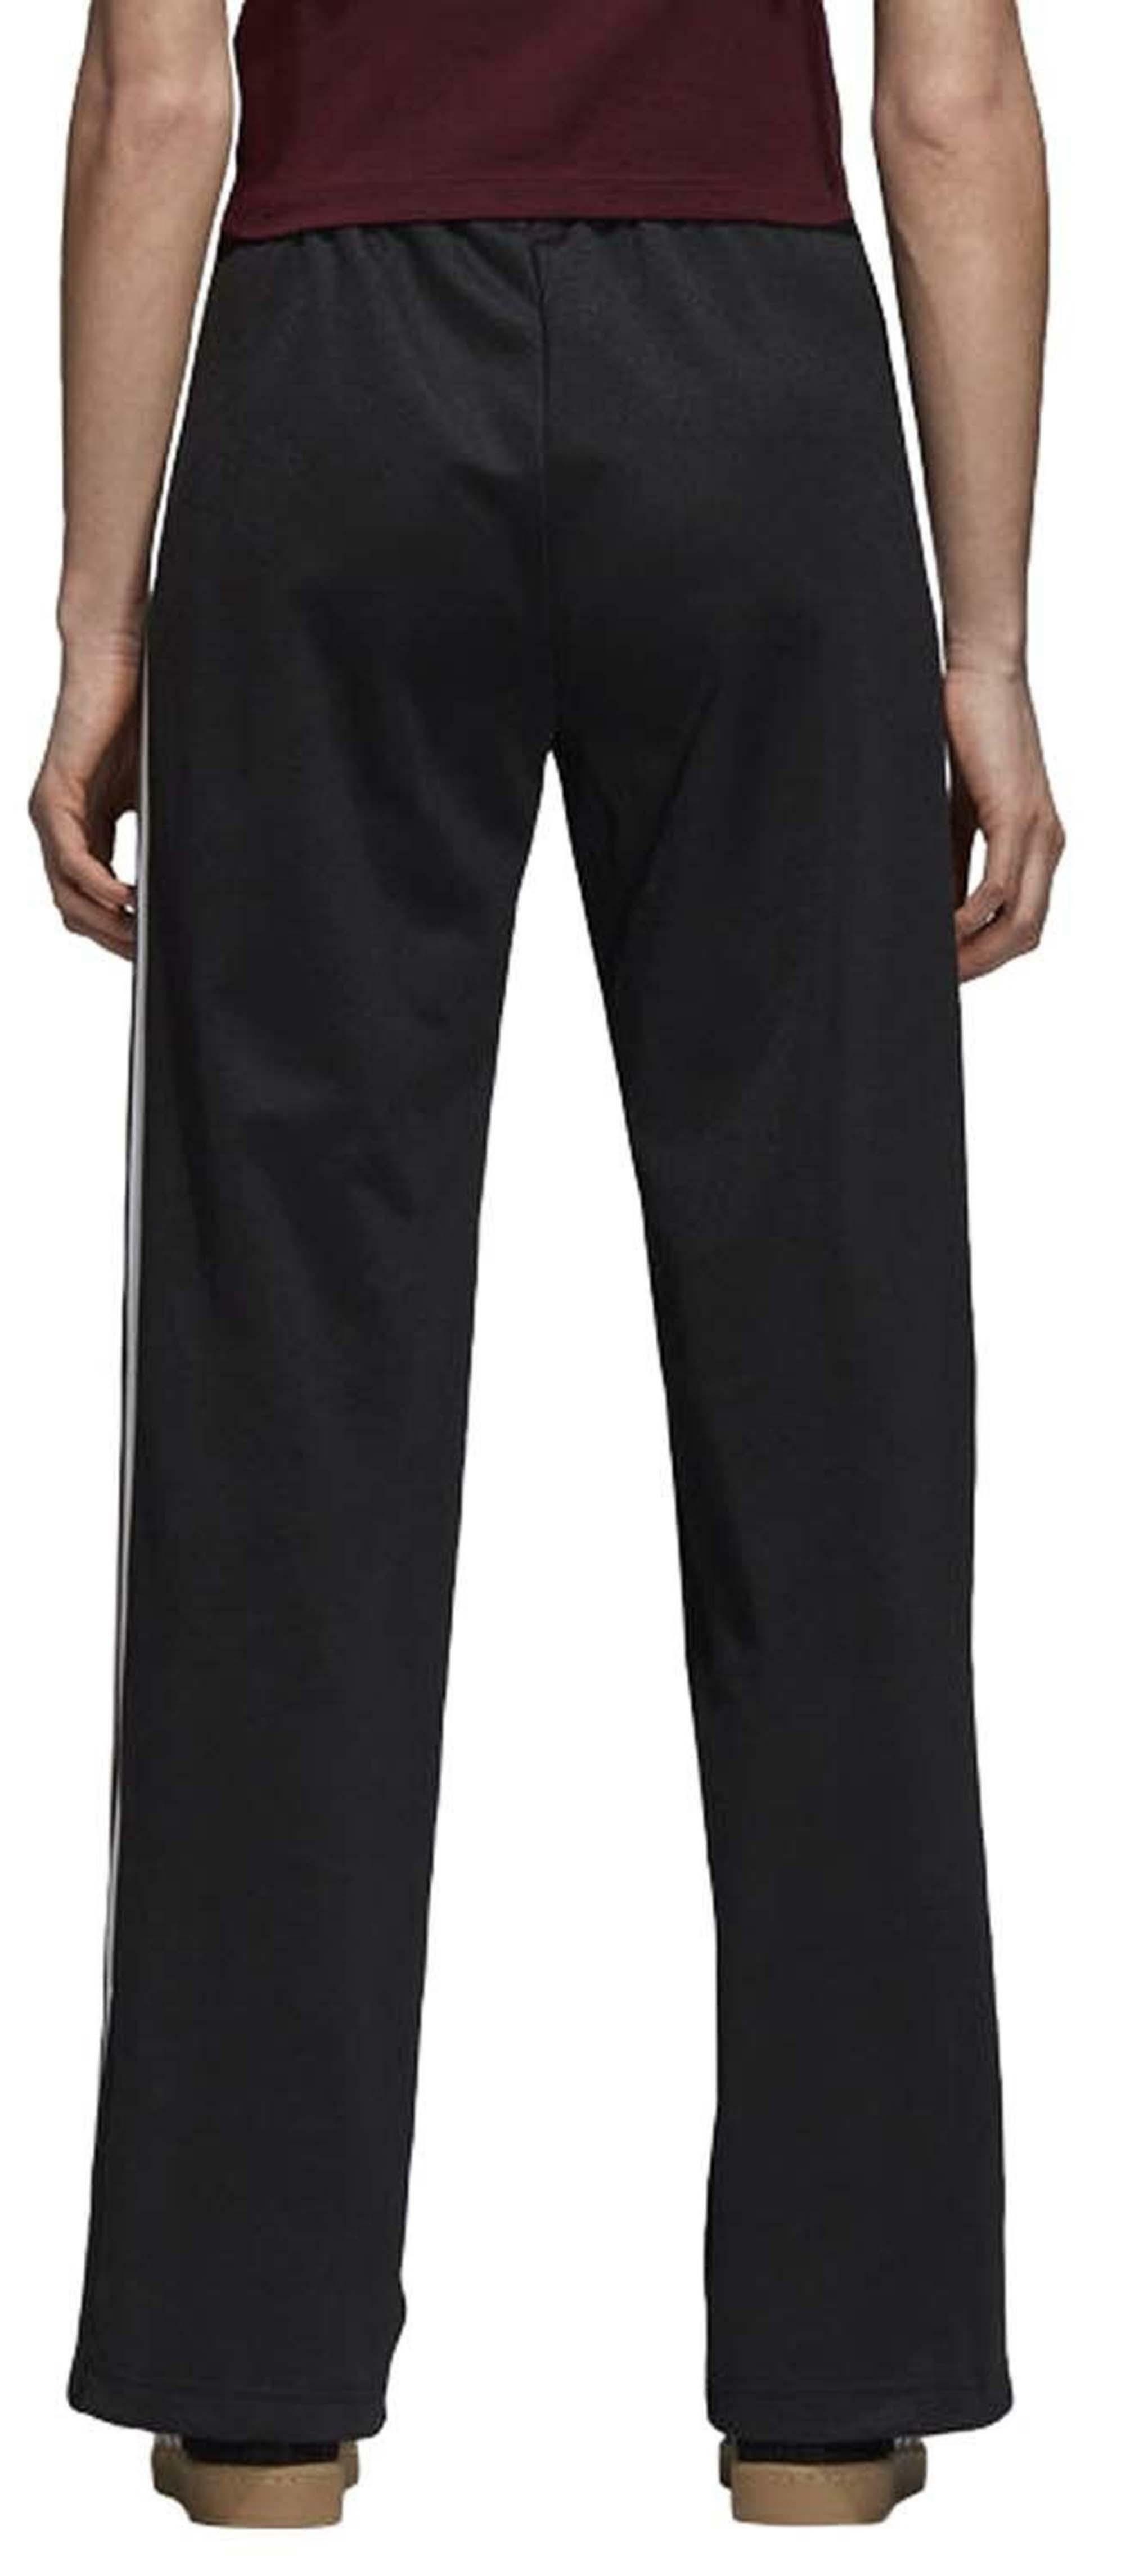 adidas adidas contemporaney pantaloni donna neri dh3190